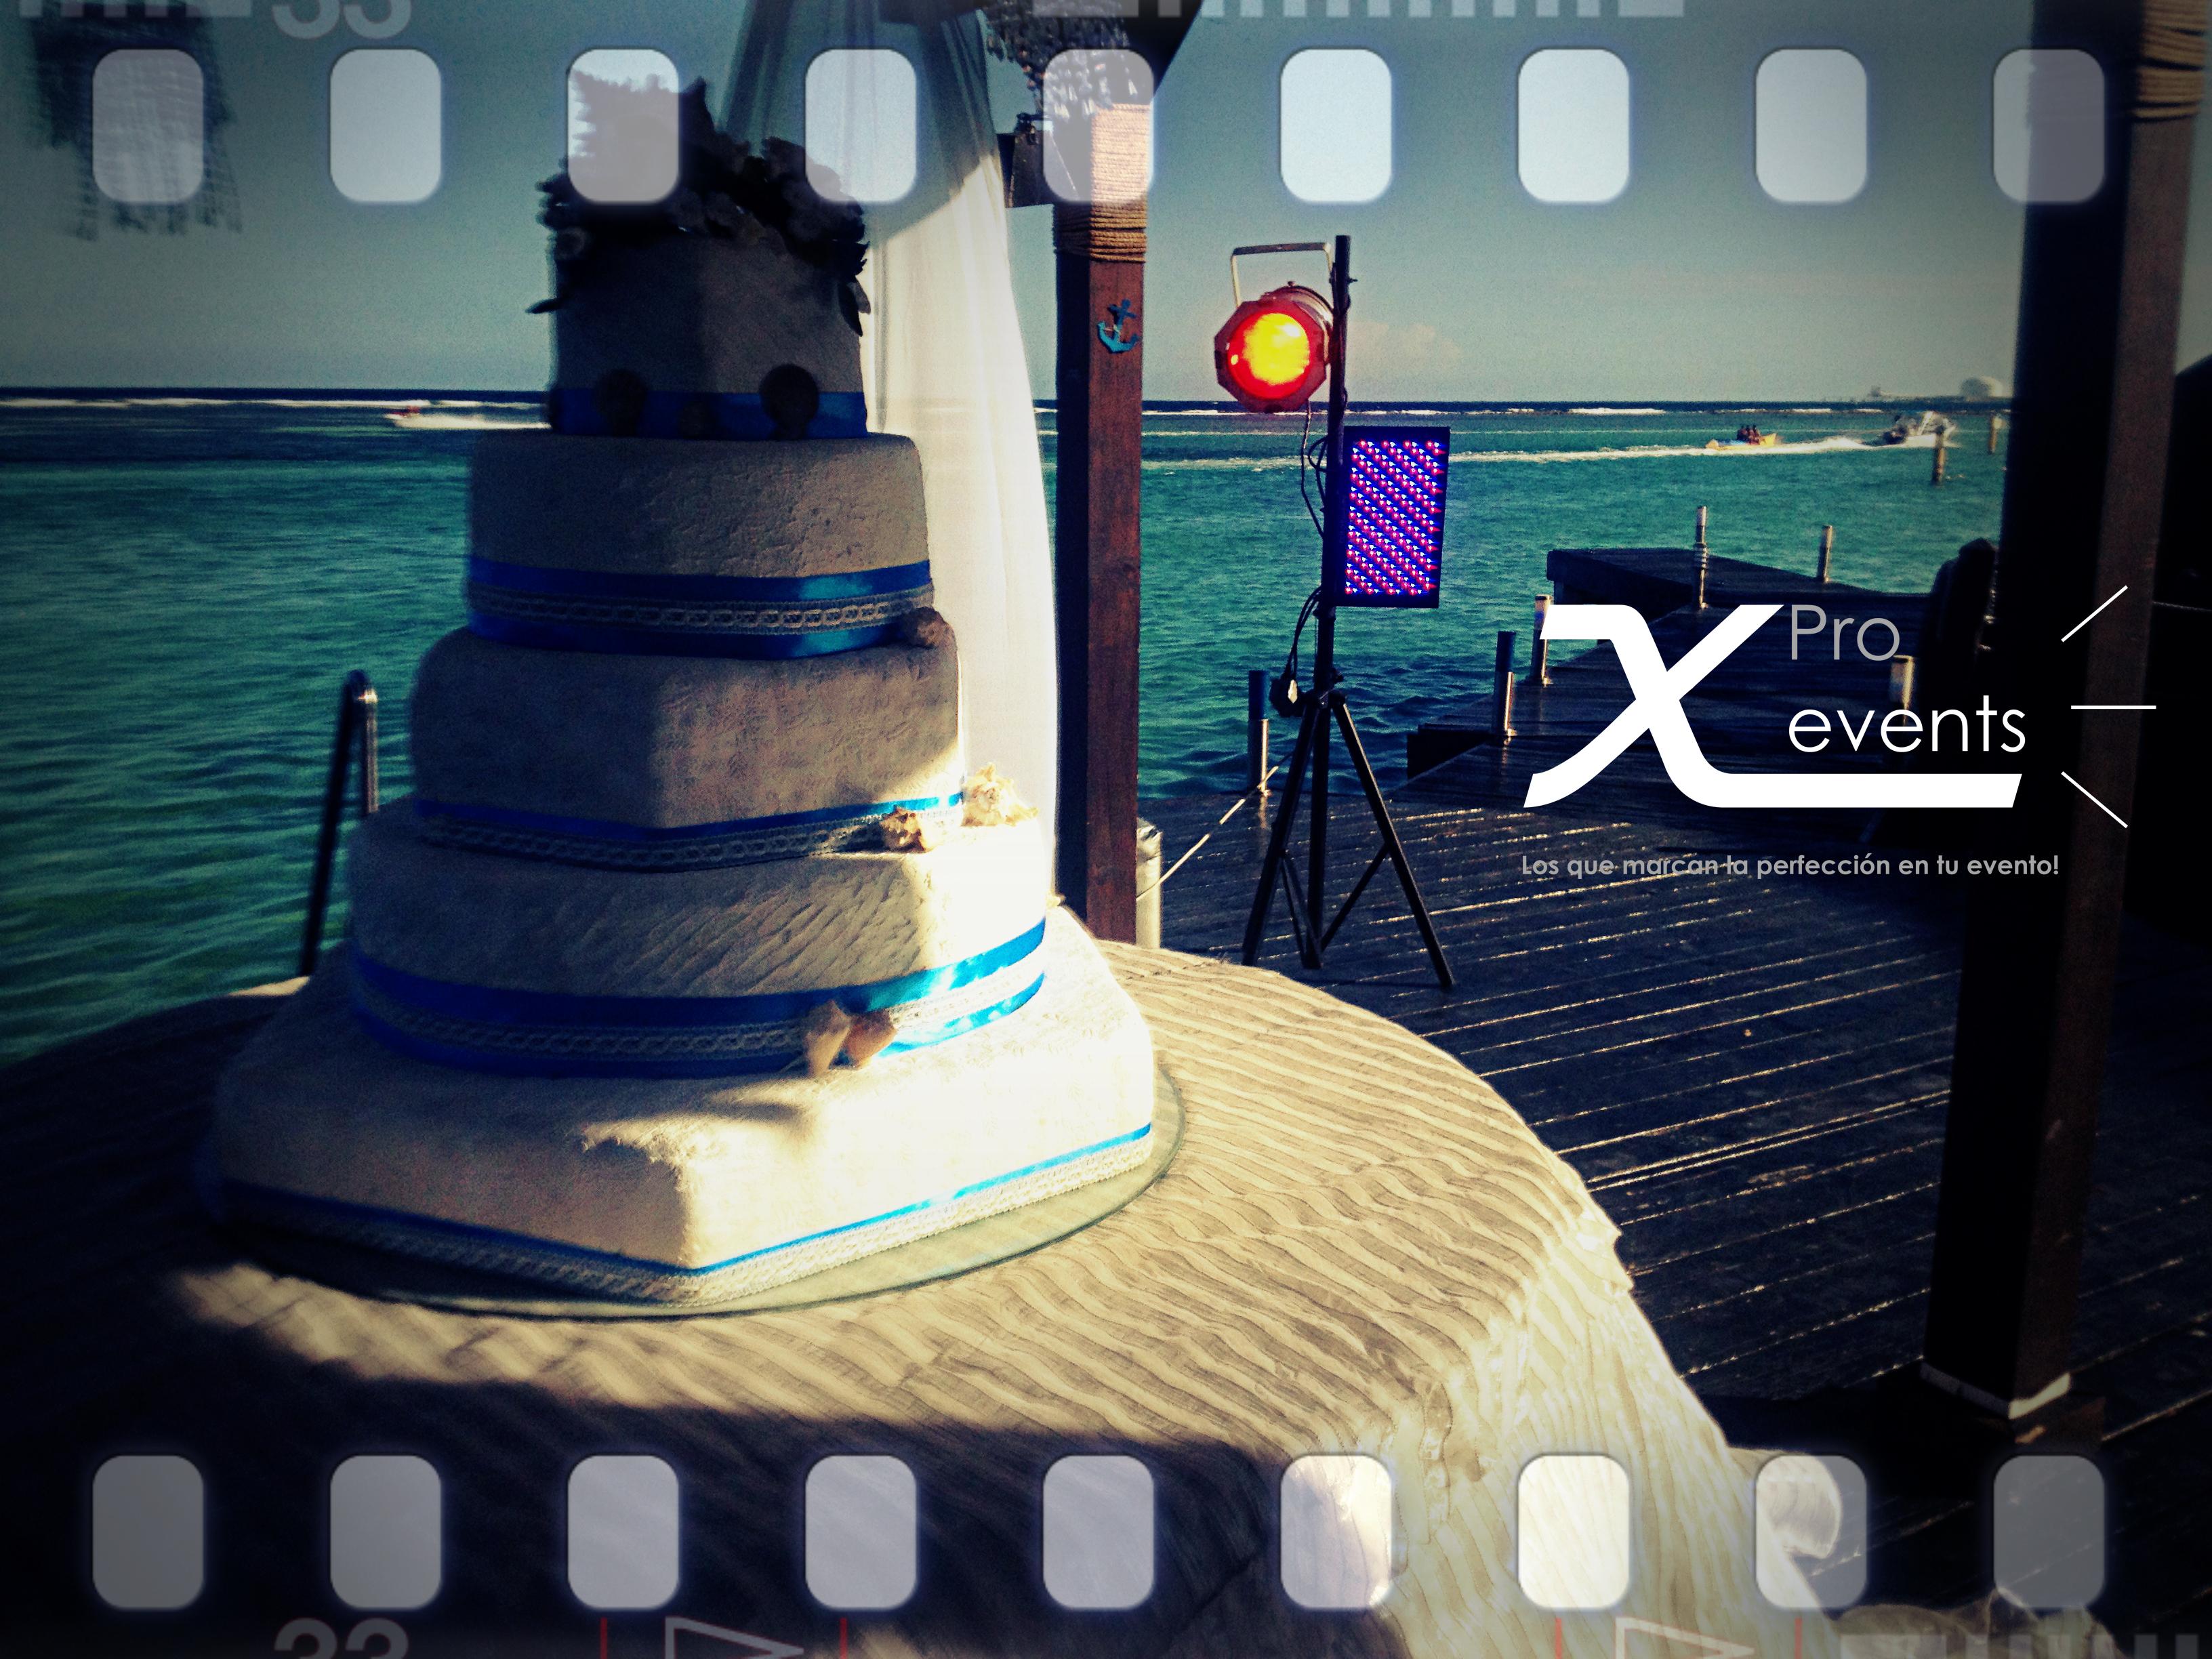 X Pro events  - 809-846-3784 - Iluminacion decorativa para el bizcocho - Hotel H